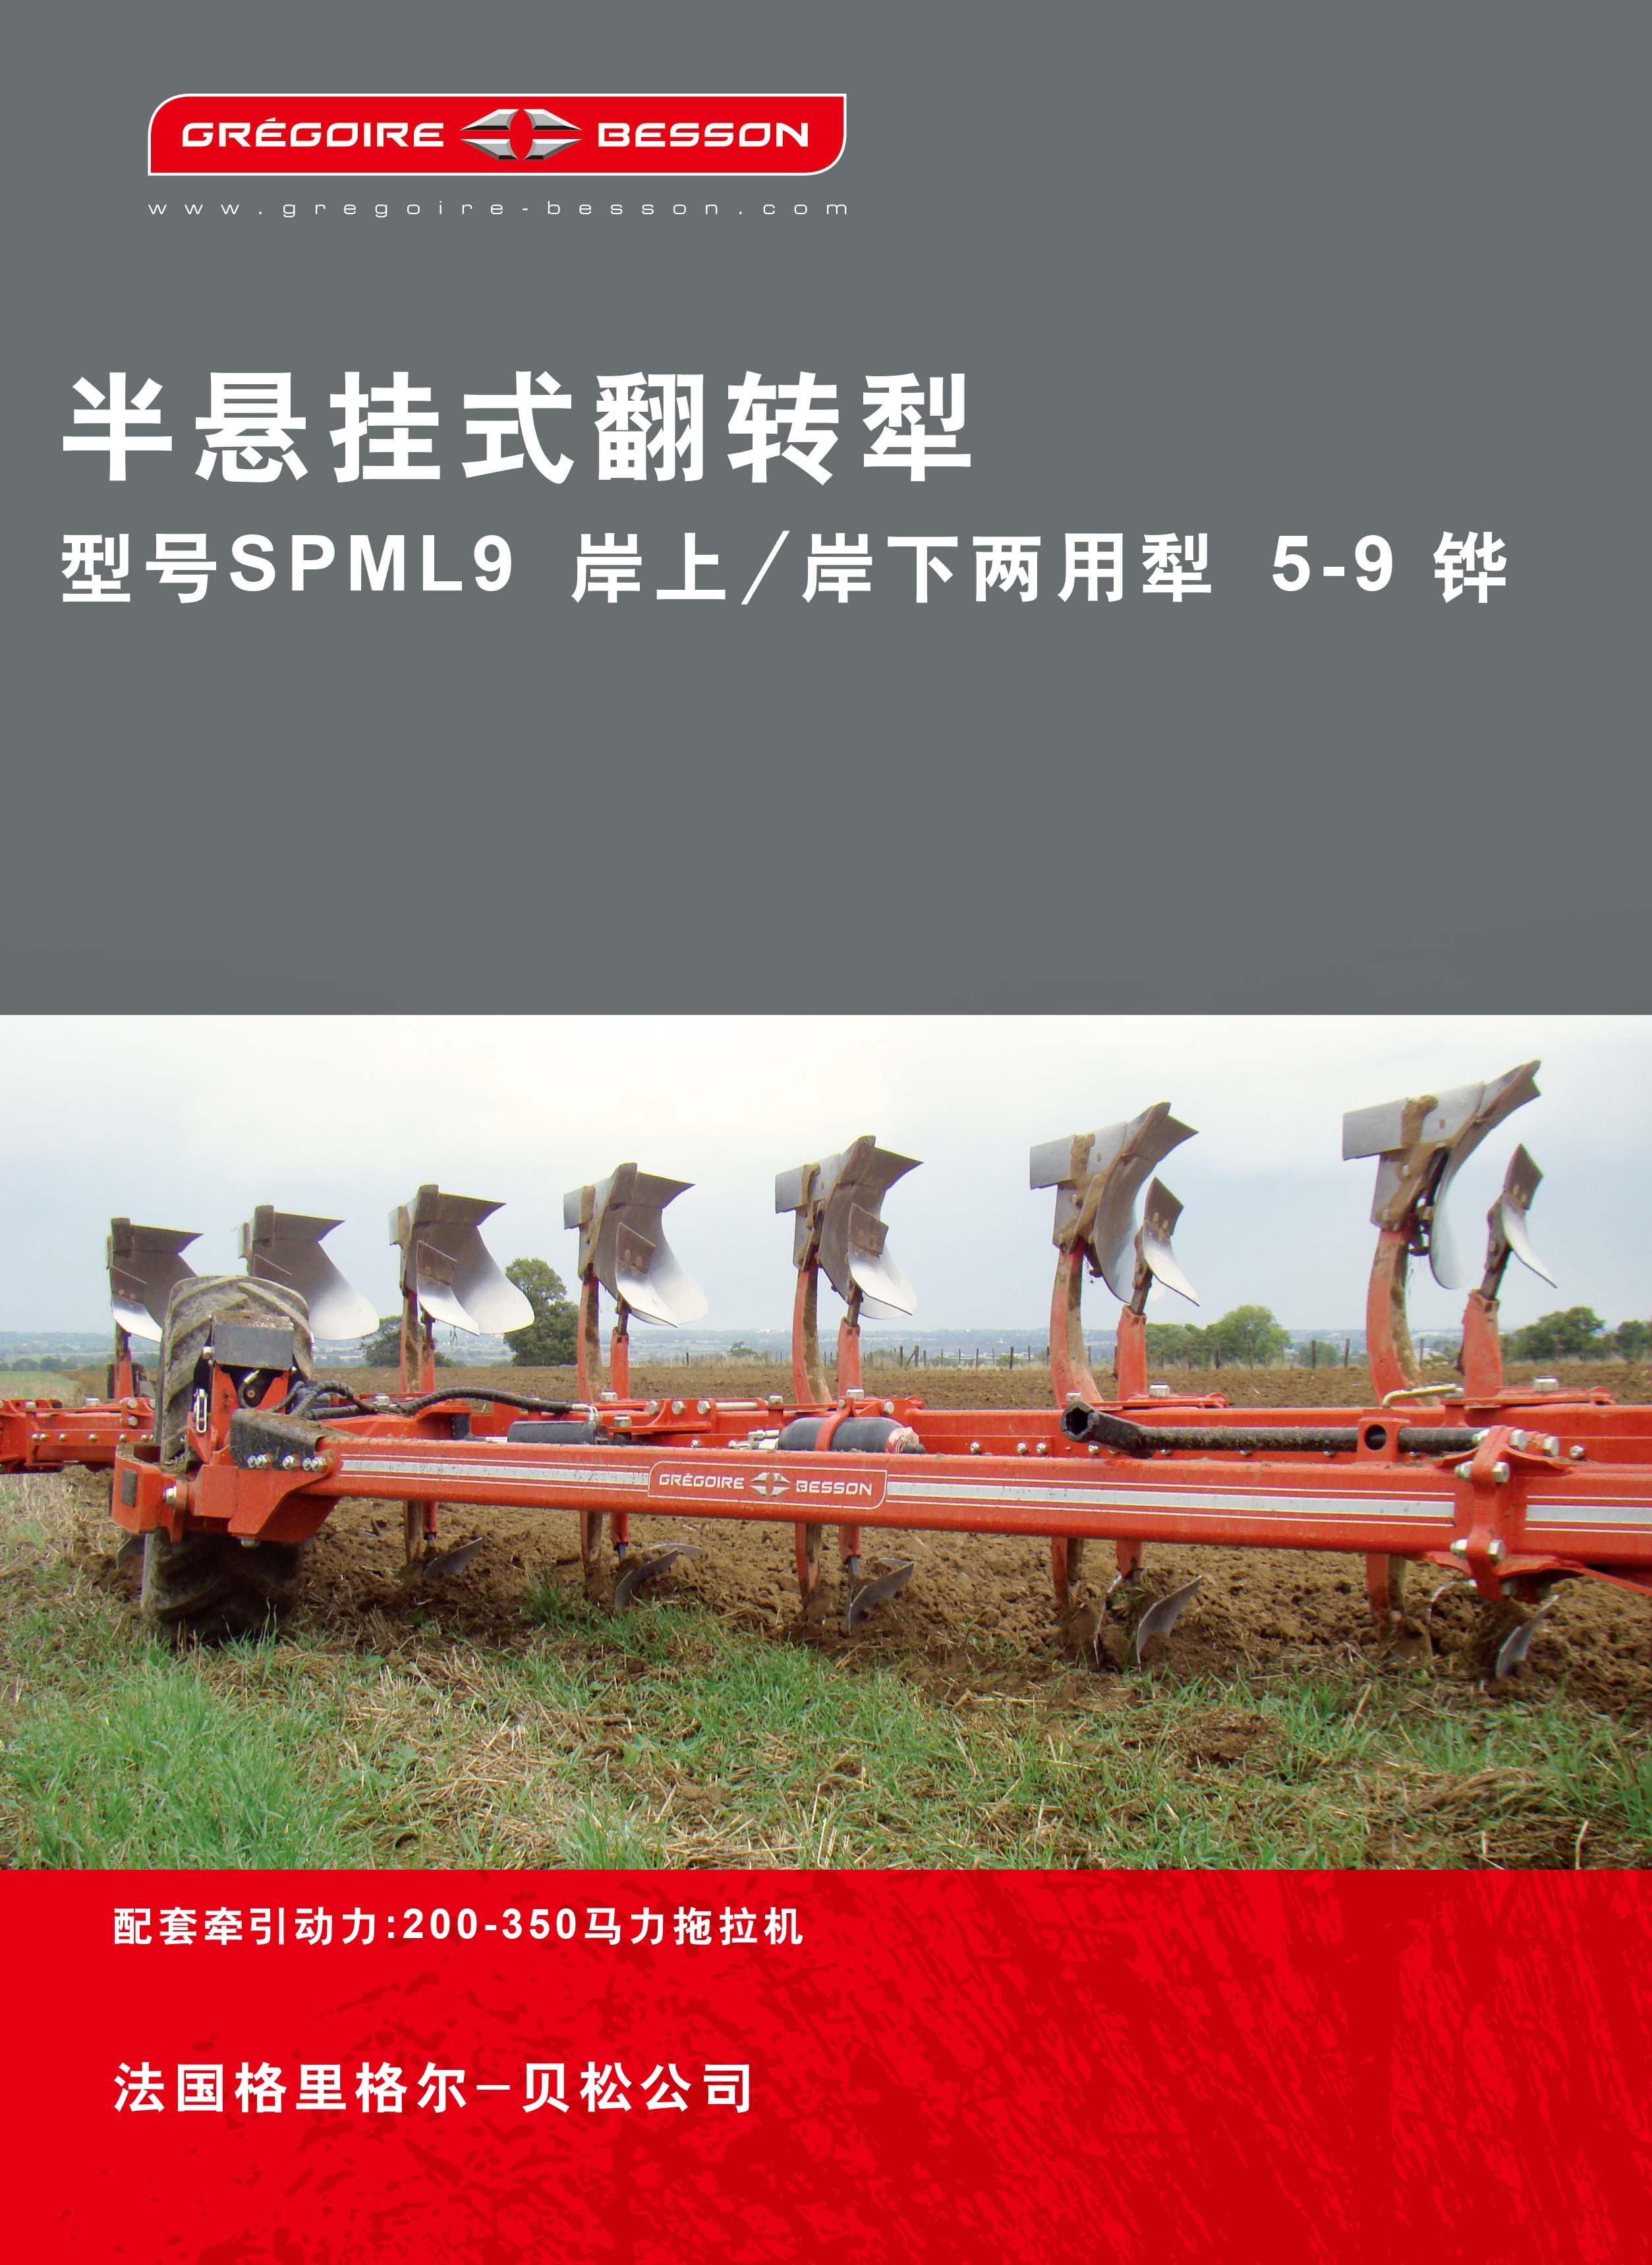 SPML9半悬挂式翻转犁